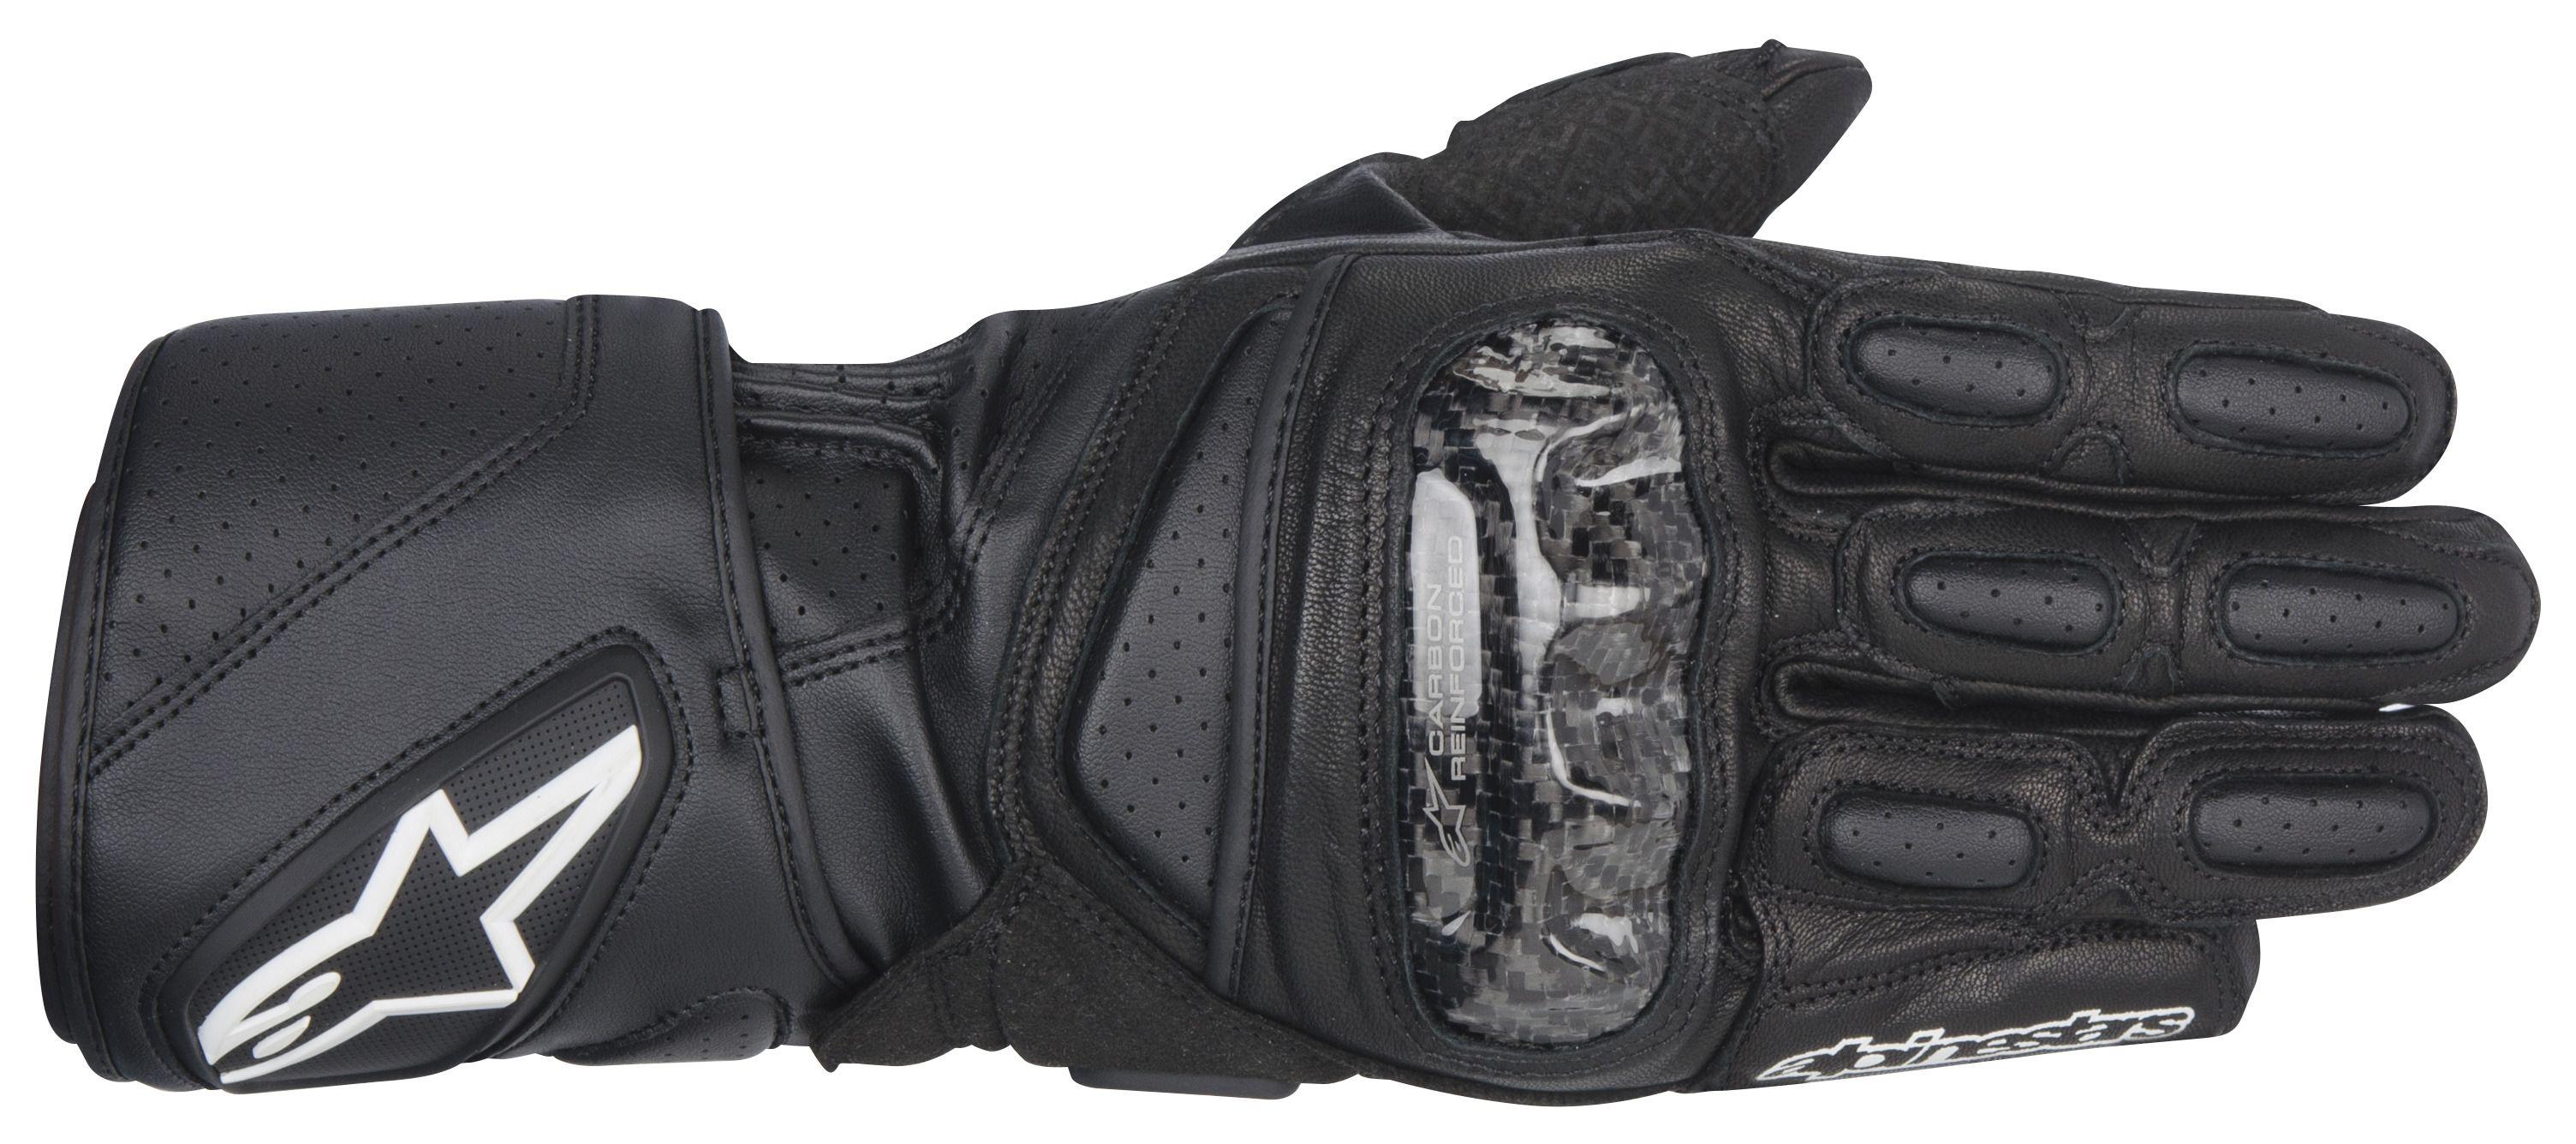 Black leather cut off gloves - Black Leather Cut Off Gloves 55